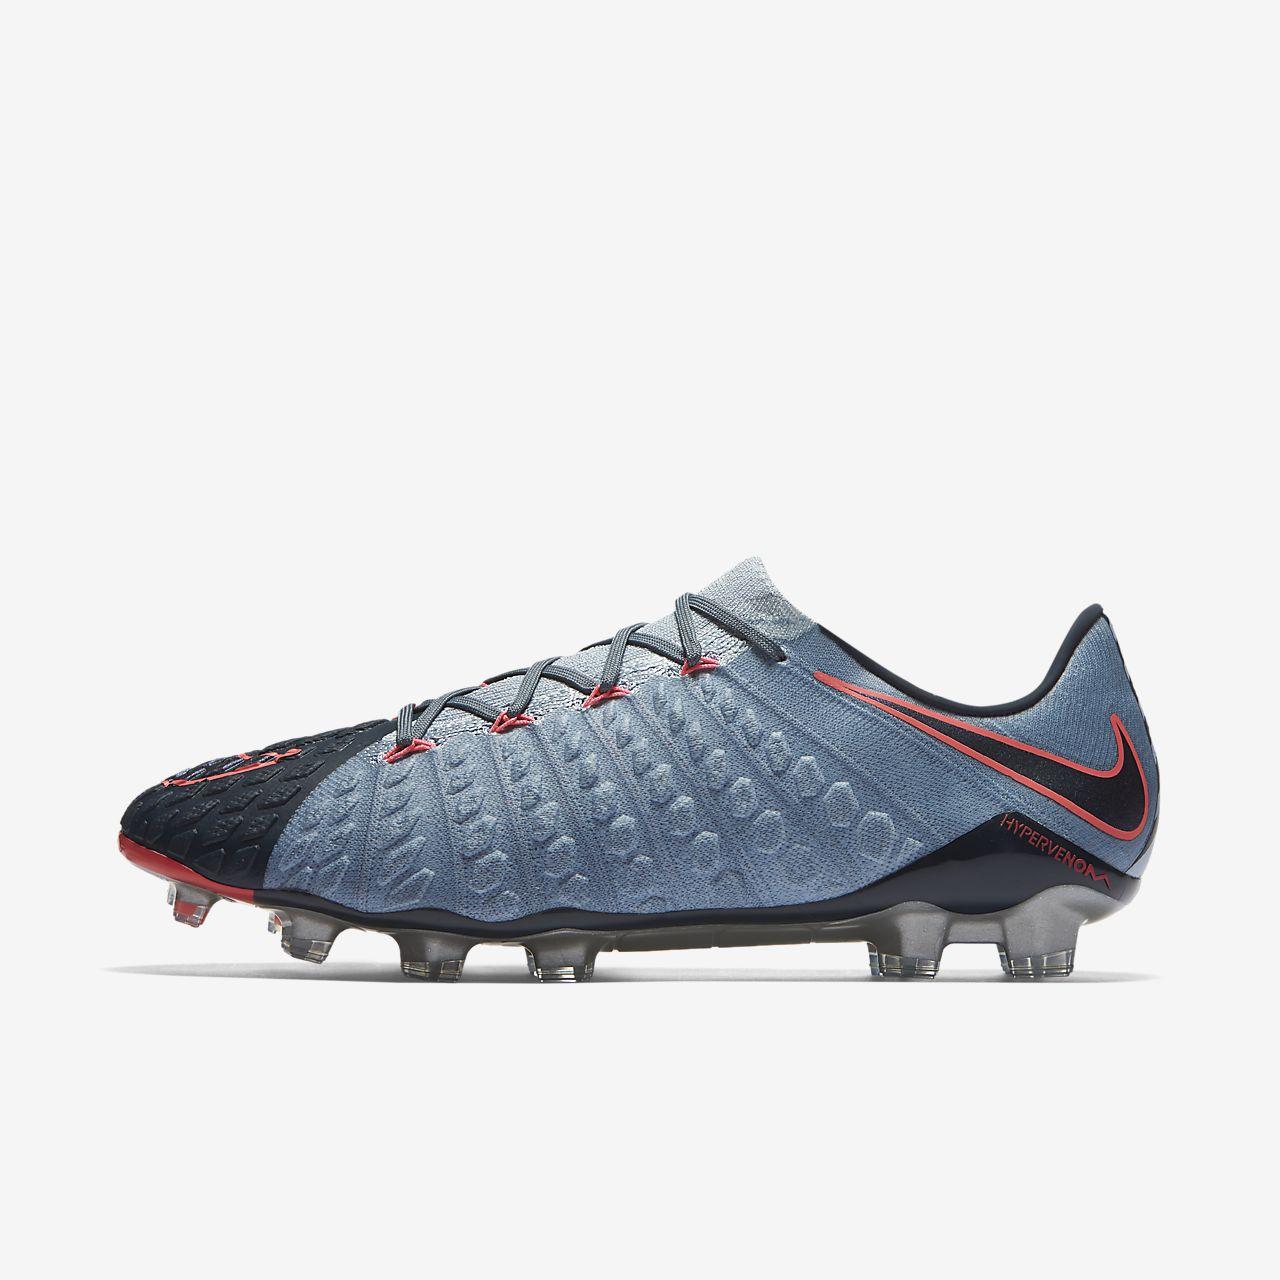 ... Nike Hypervenom Phantom 3 Firm-Ground Soccer Cleat